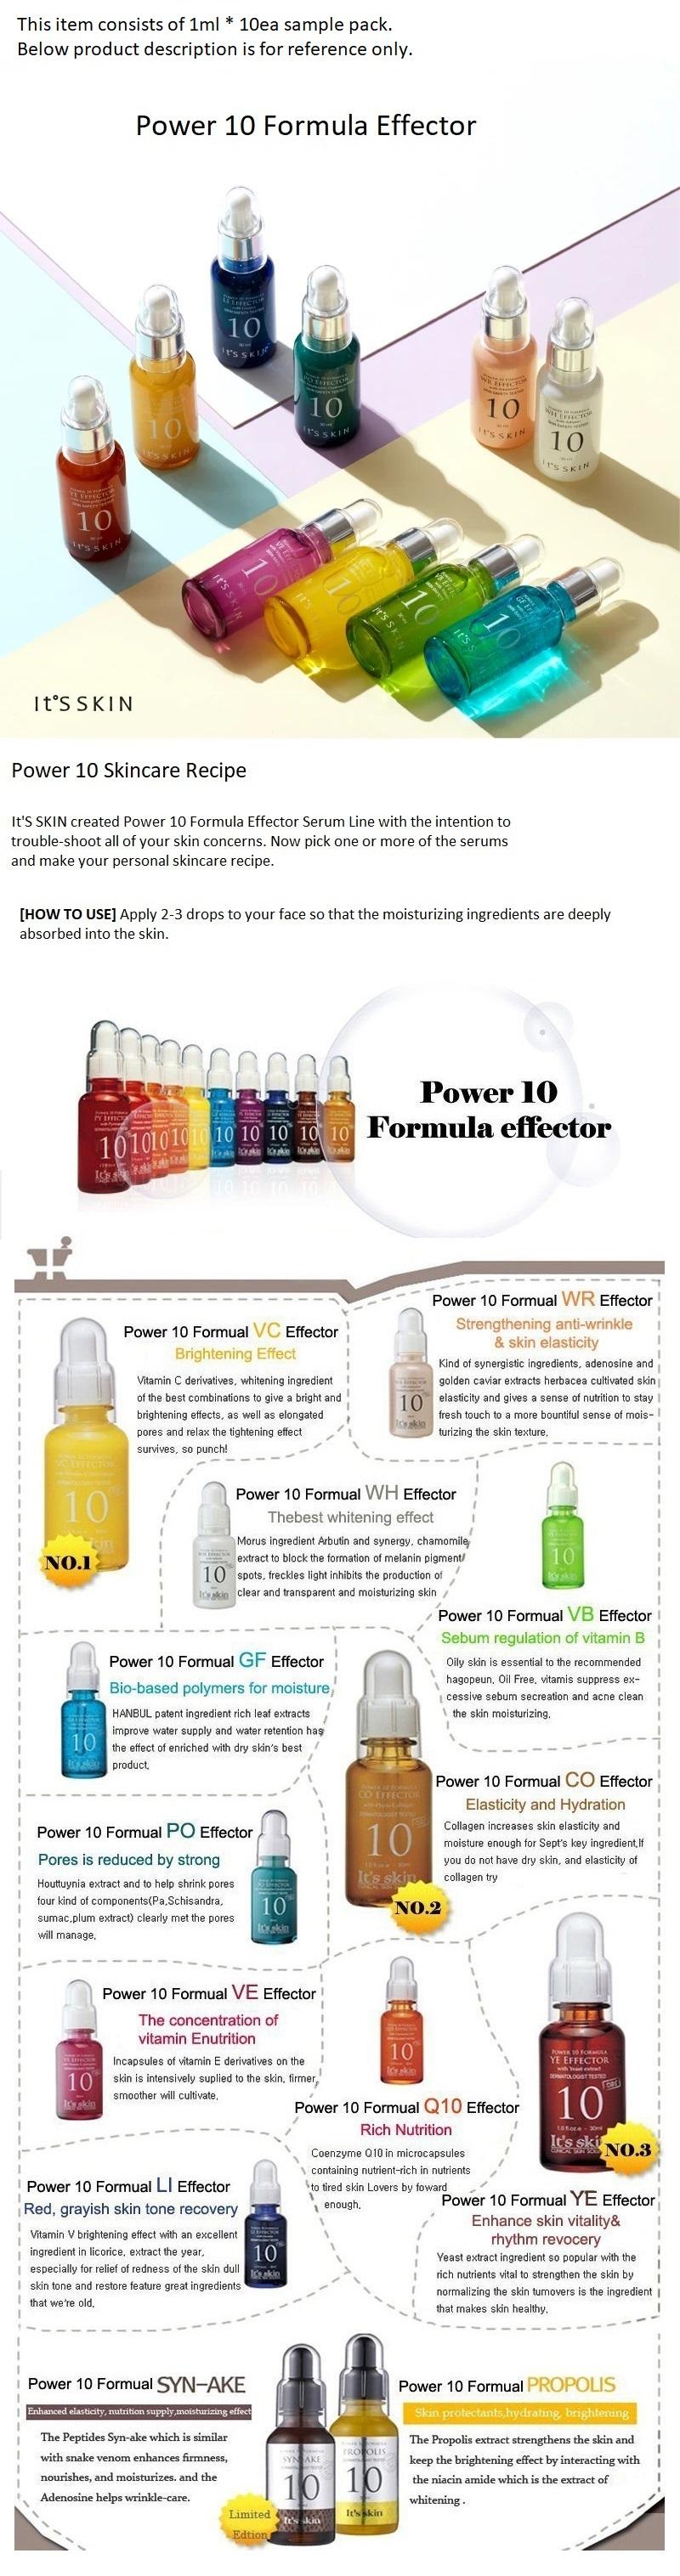 Power 10 Formula Effector 1ml 10ea Sample - SYN-AKE